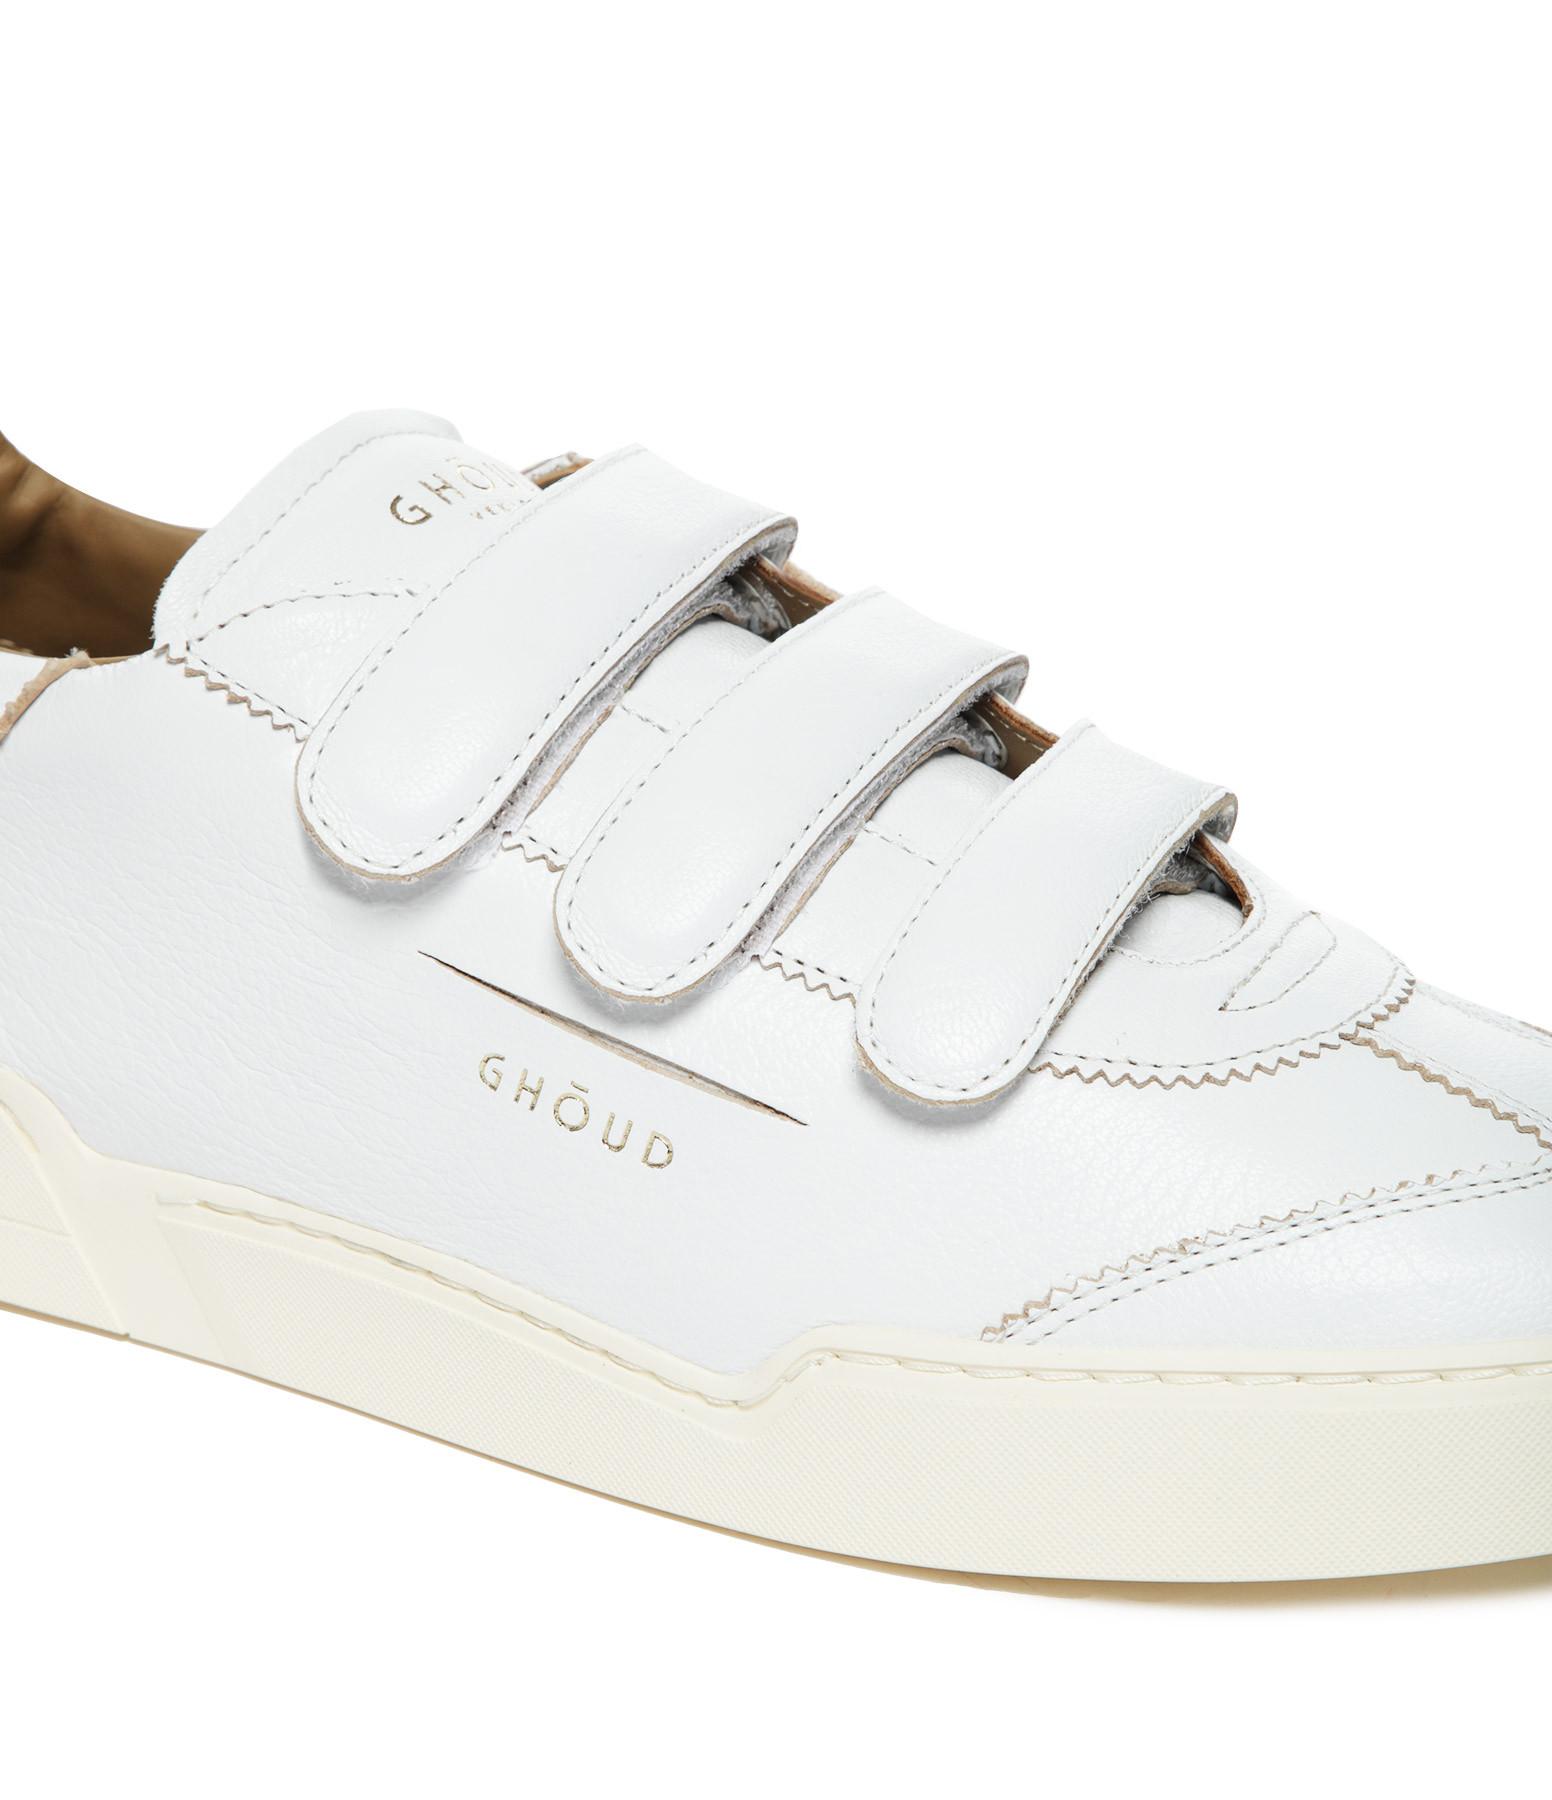 GHOUD VENICE - Baskets Lob Stripes Cuir Blanc